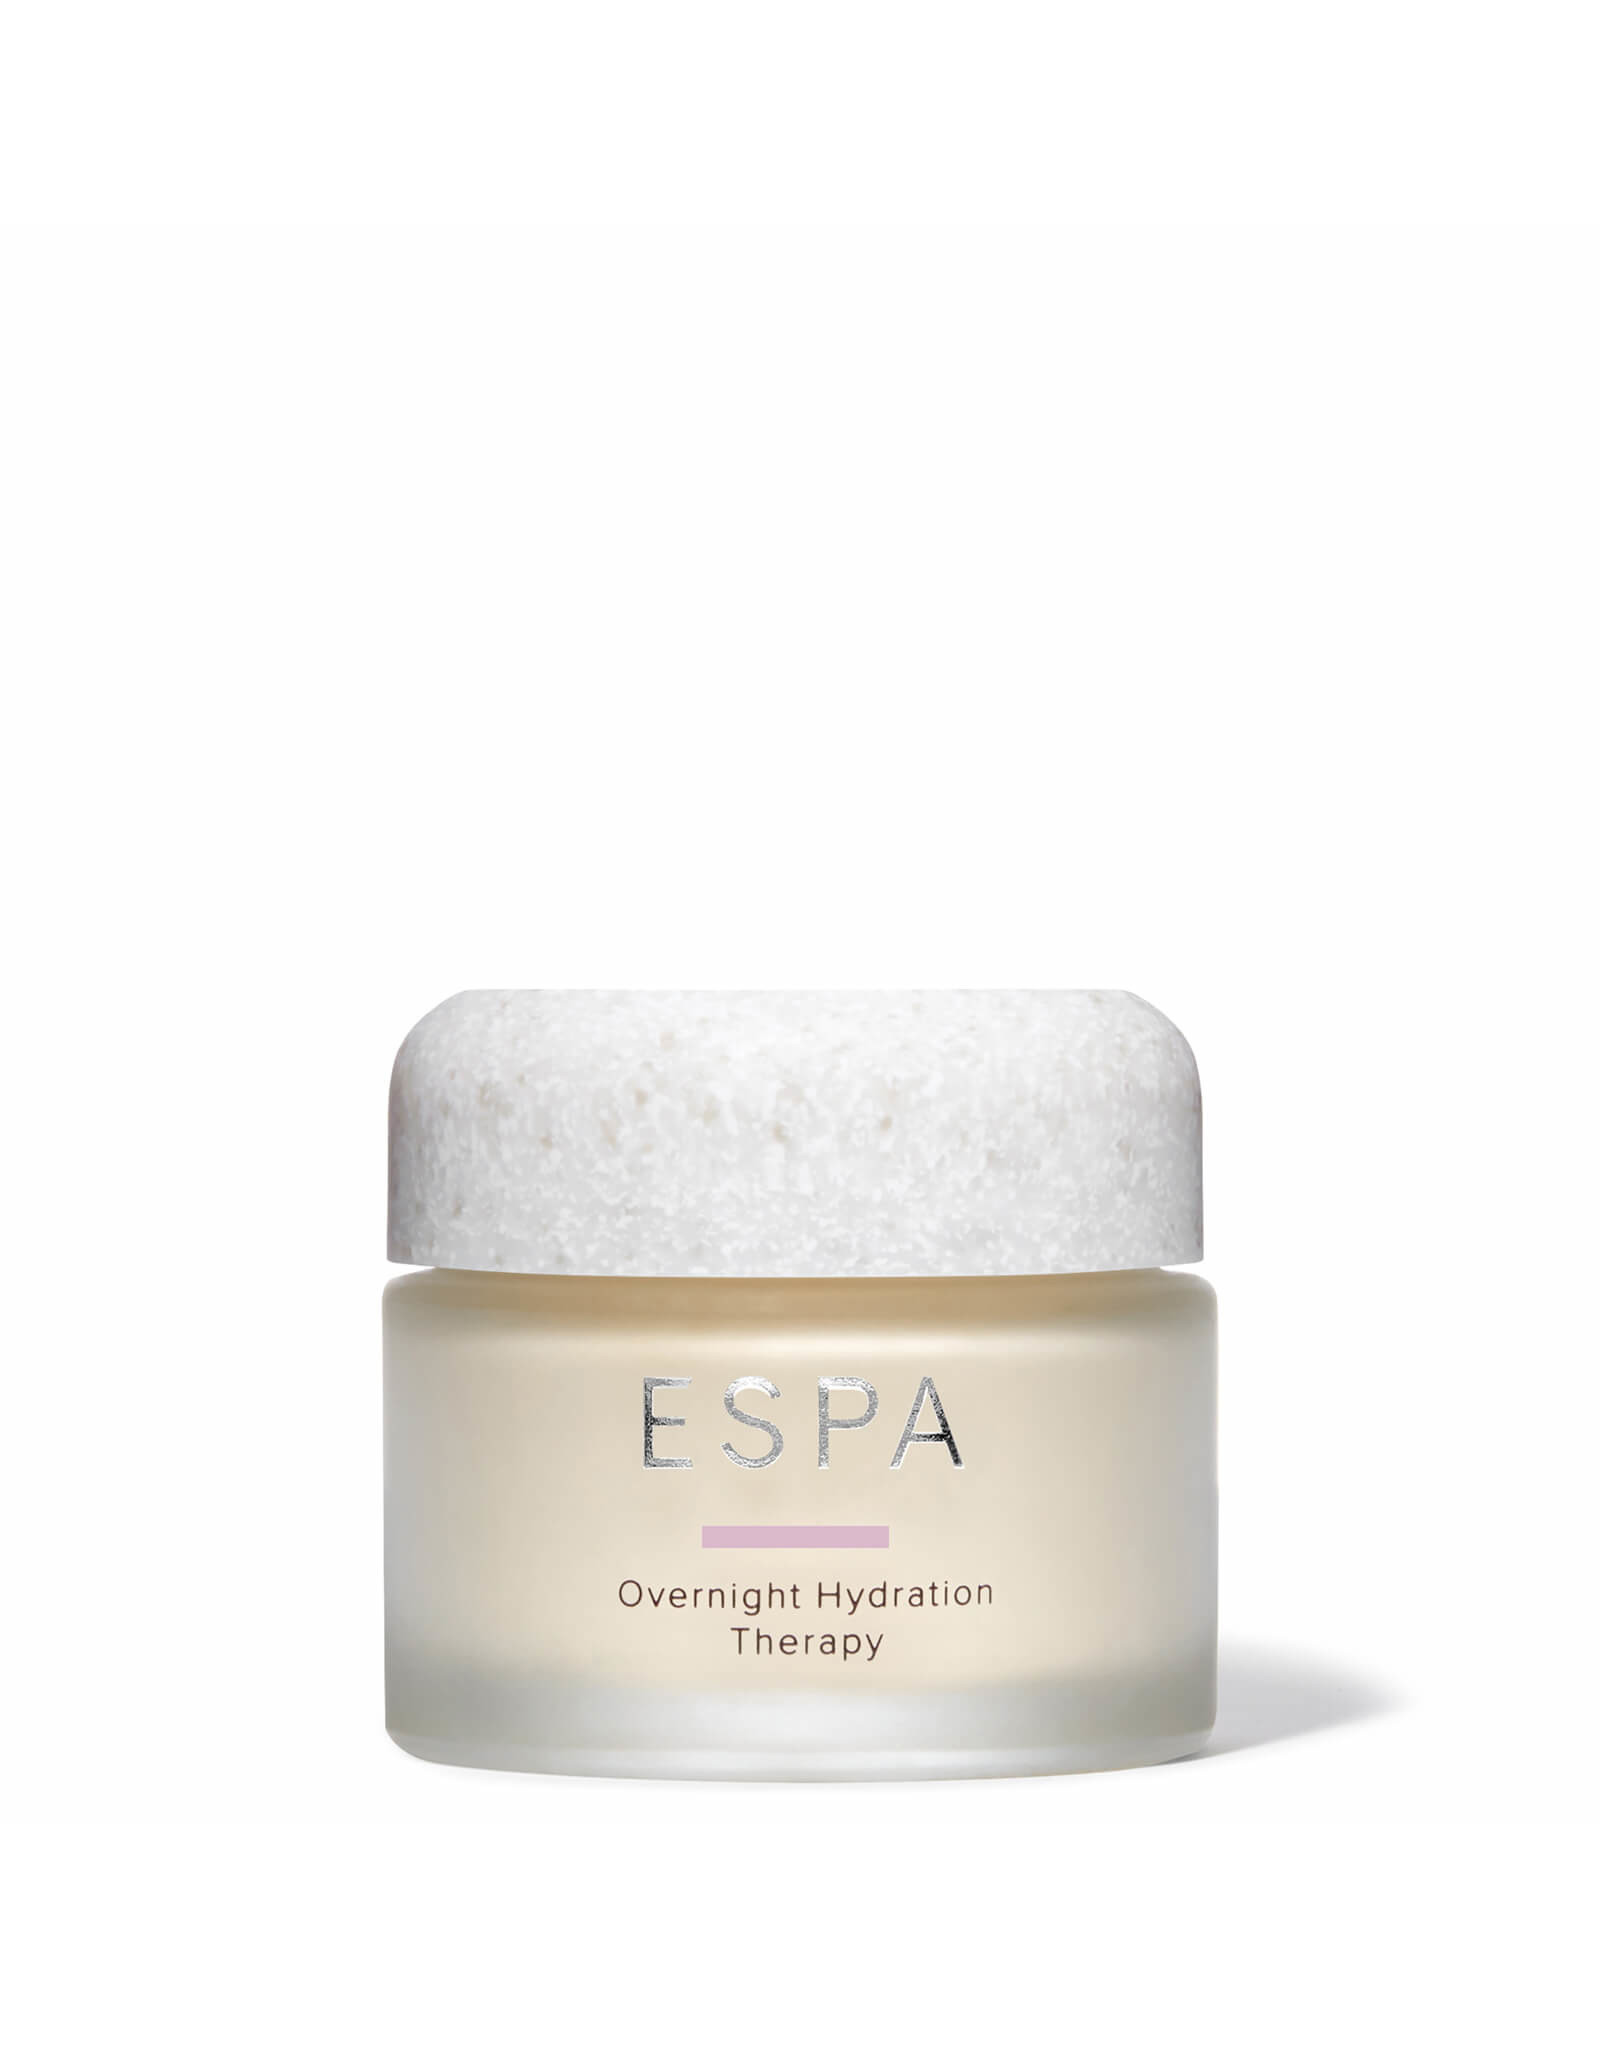 ESPA Overnight Hydration Therapy